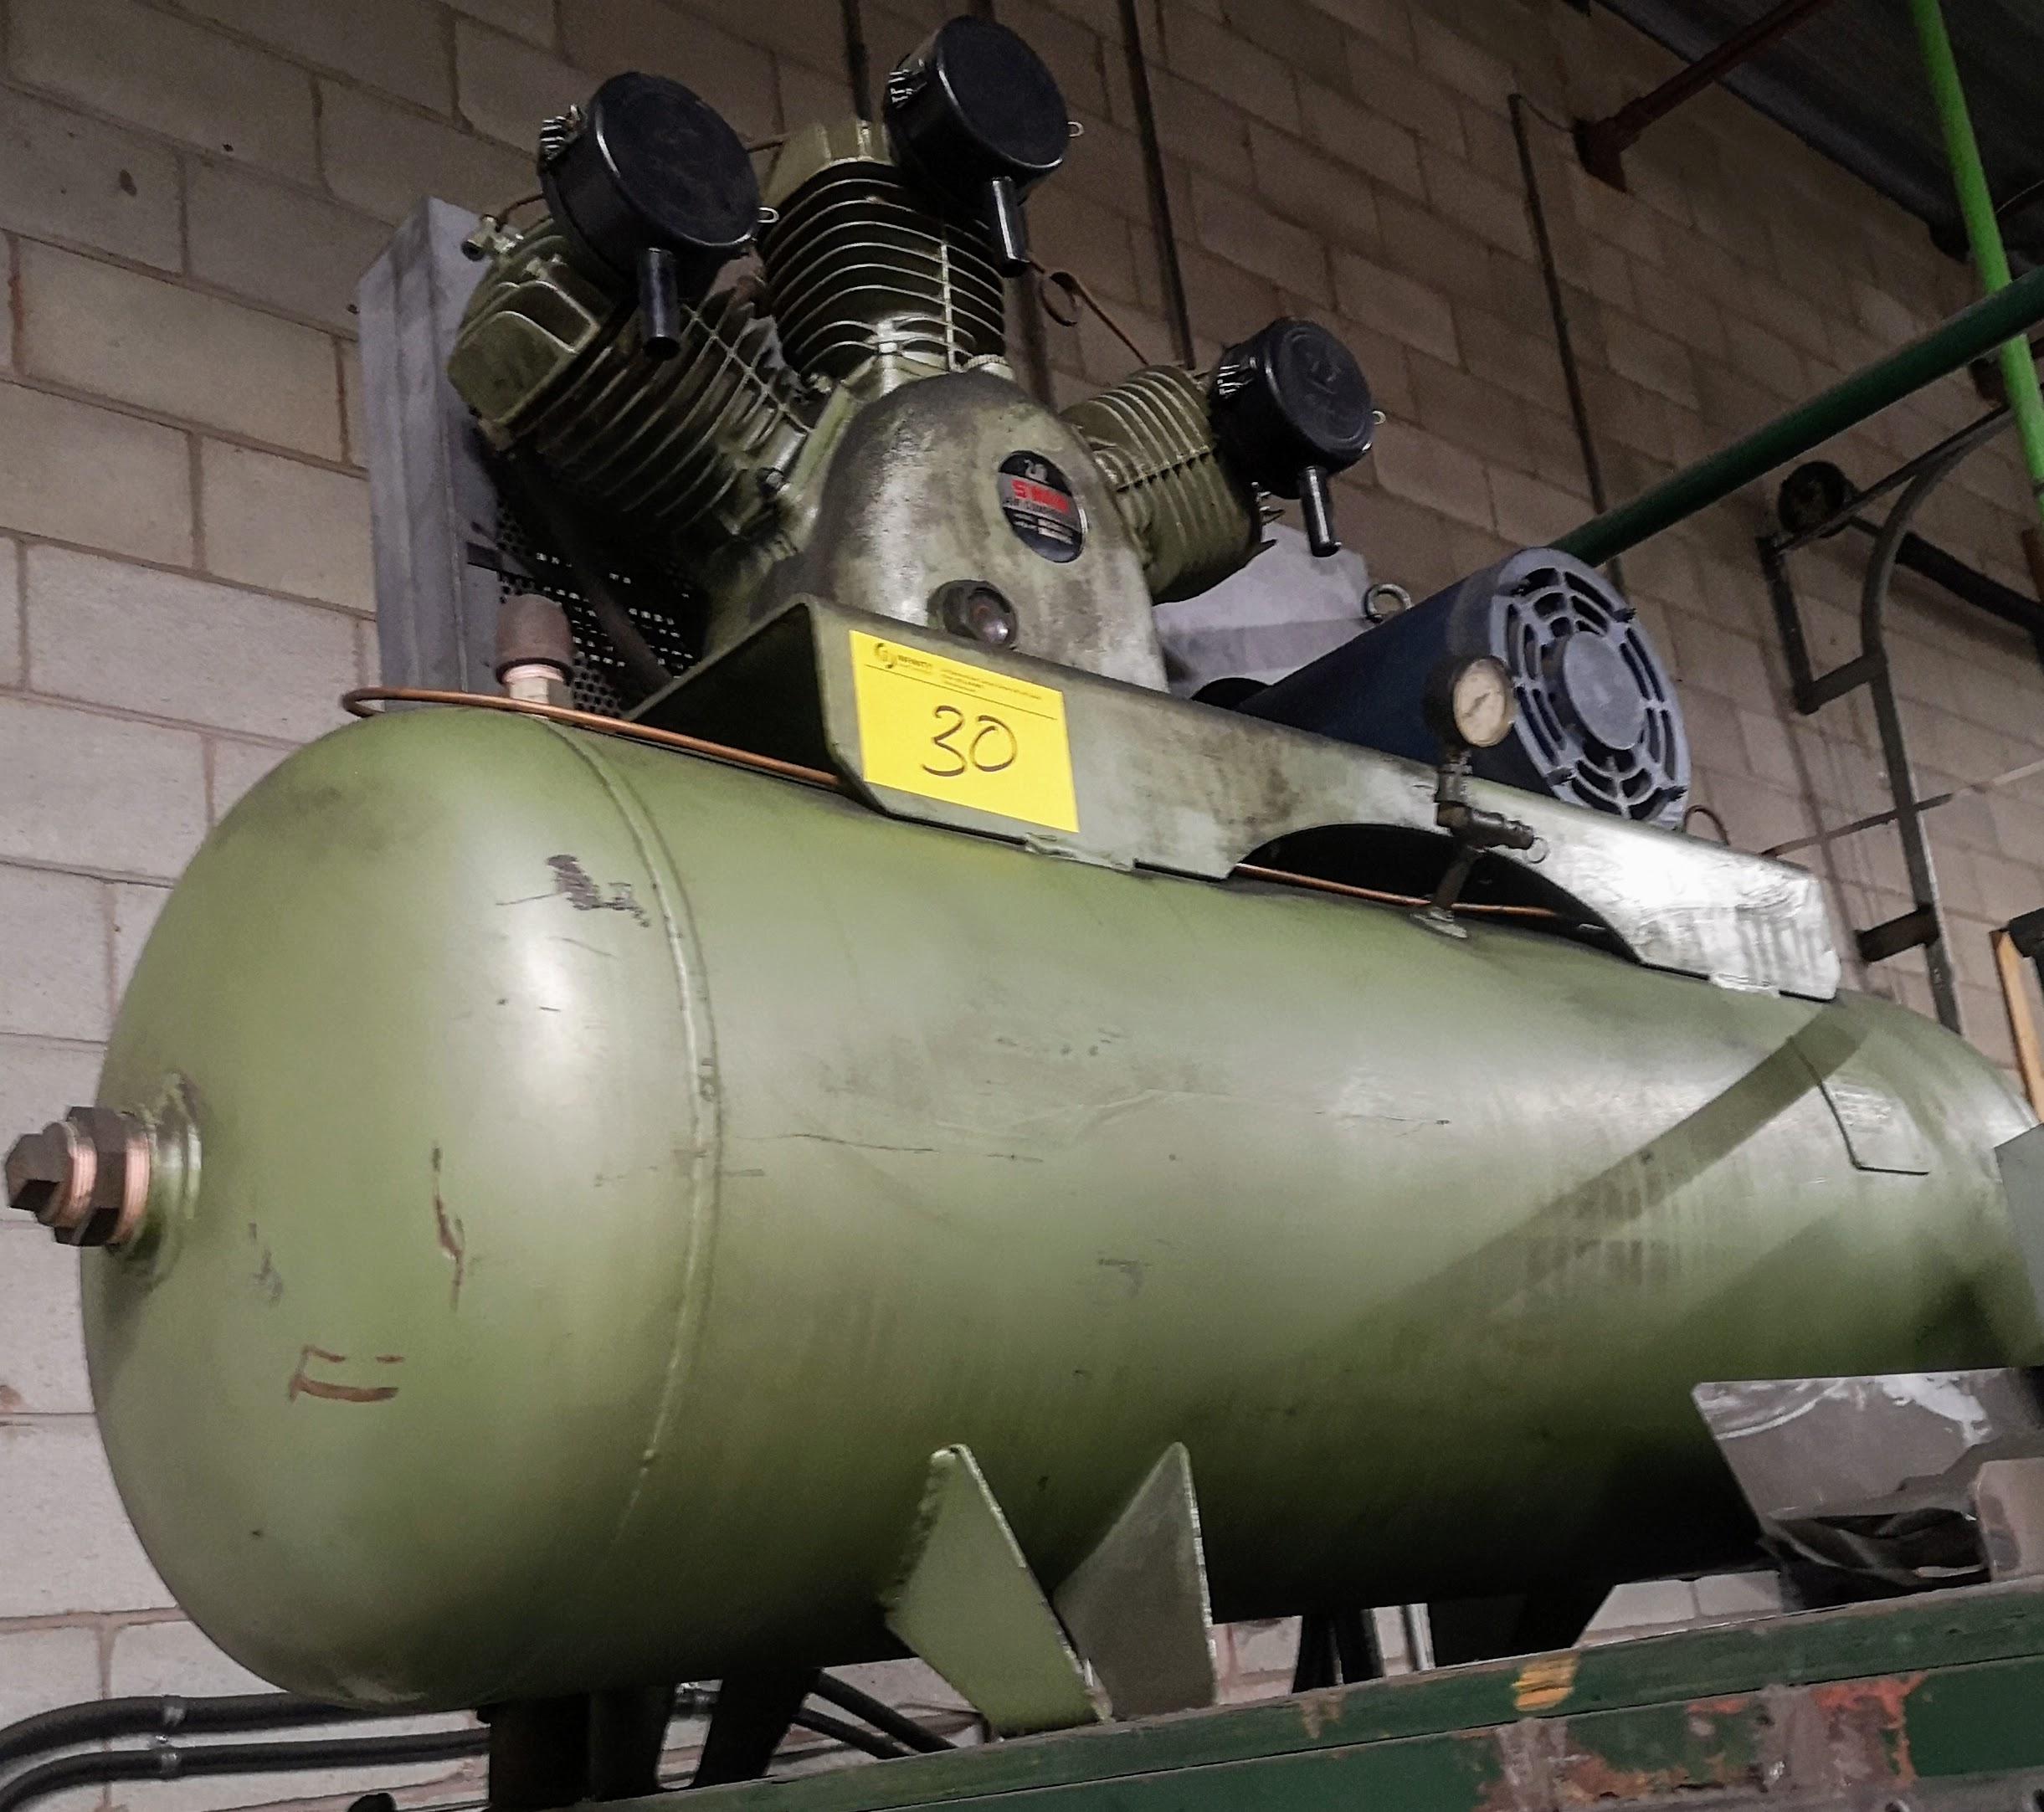 Lot 30 - SWAN 10HP AIR COMPRESSOR